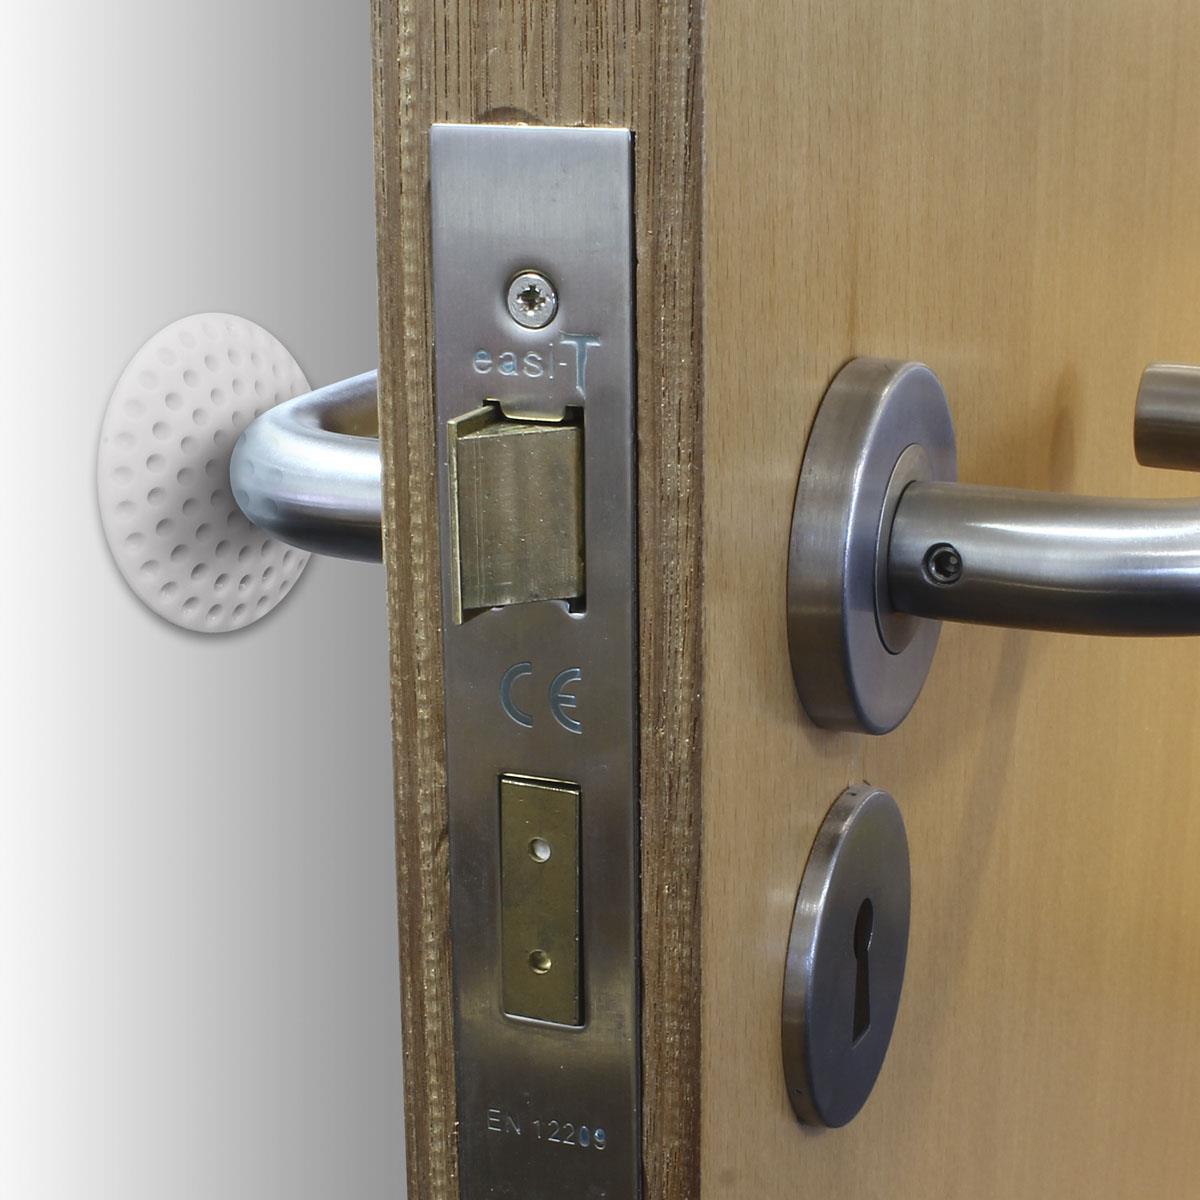 5-x-Wall-Protector-Self-Adhesive-Rubber-Stop-Door-Handle-Bumper-Guard-Stopper miniatuur 11